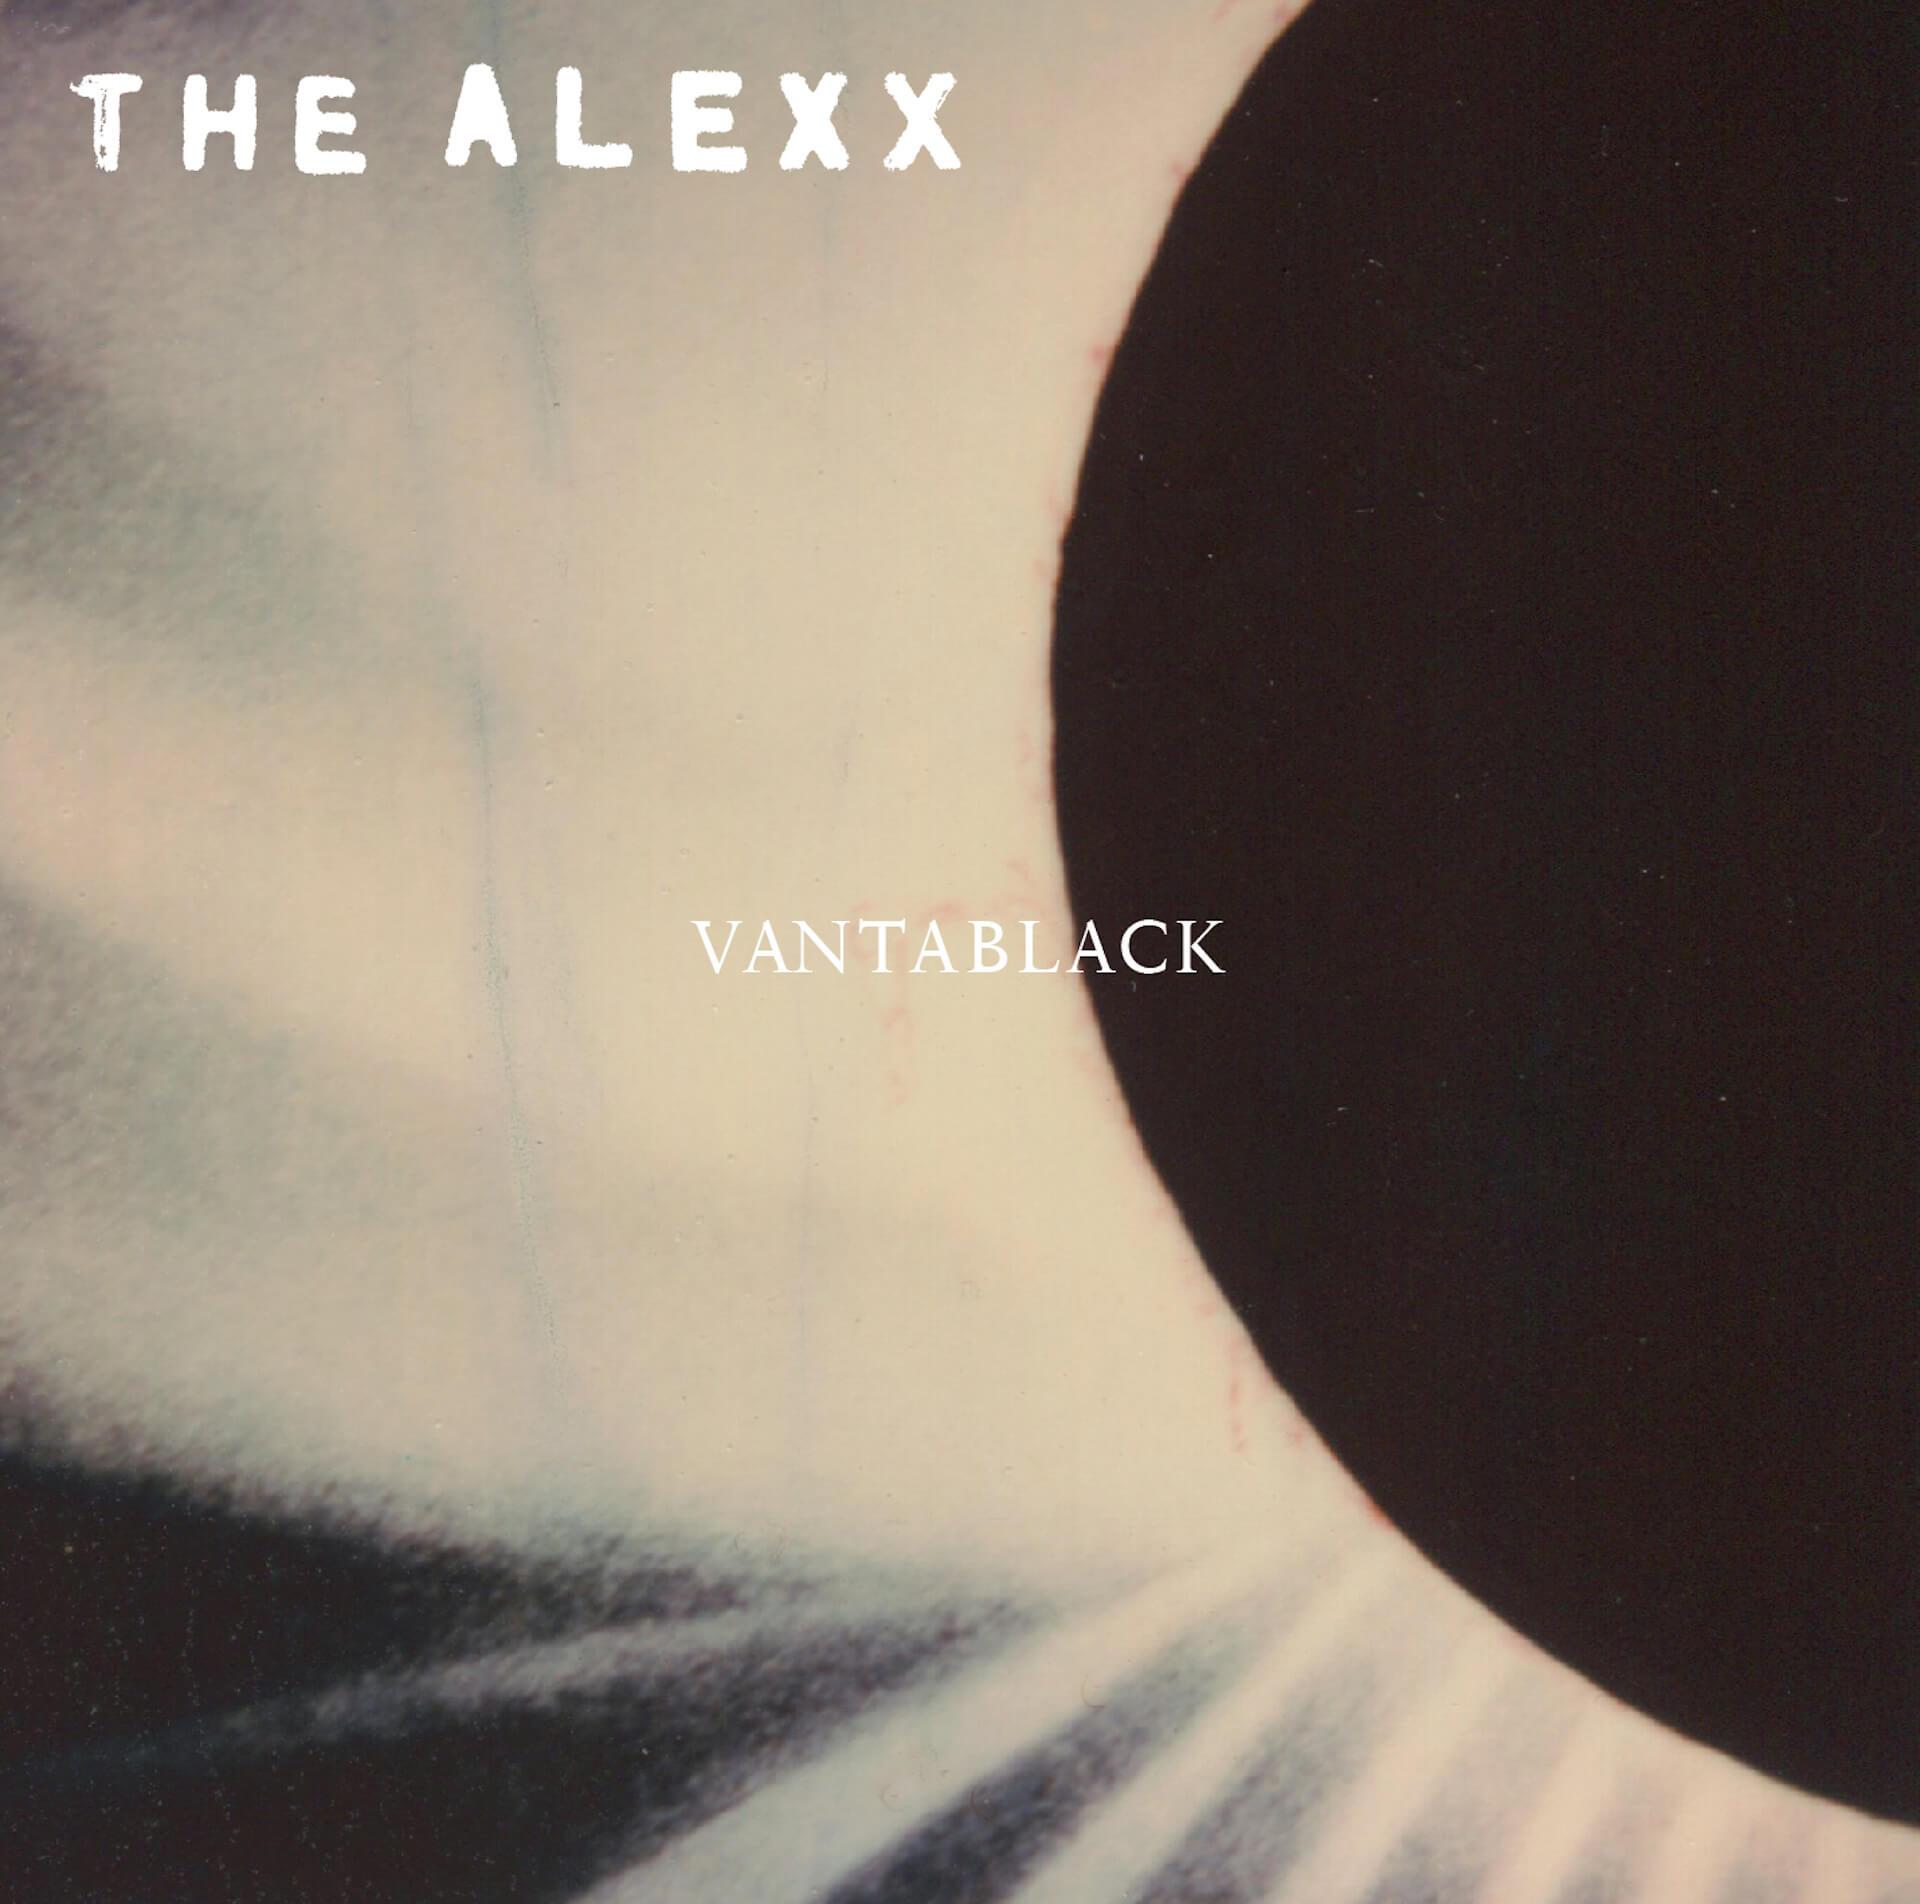 〈REXY SONG〉初の日本人アーティストTHE ALEXXがデビューアルバム『VANTABLACK』リリース決定! music191018_thealexx_album_main